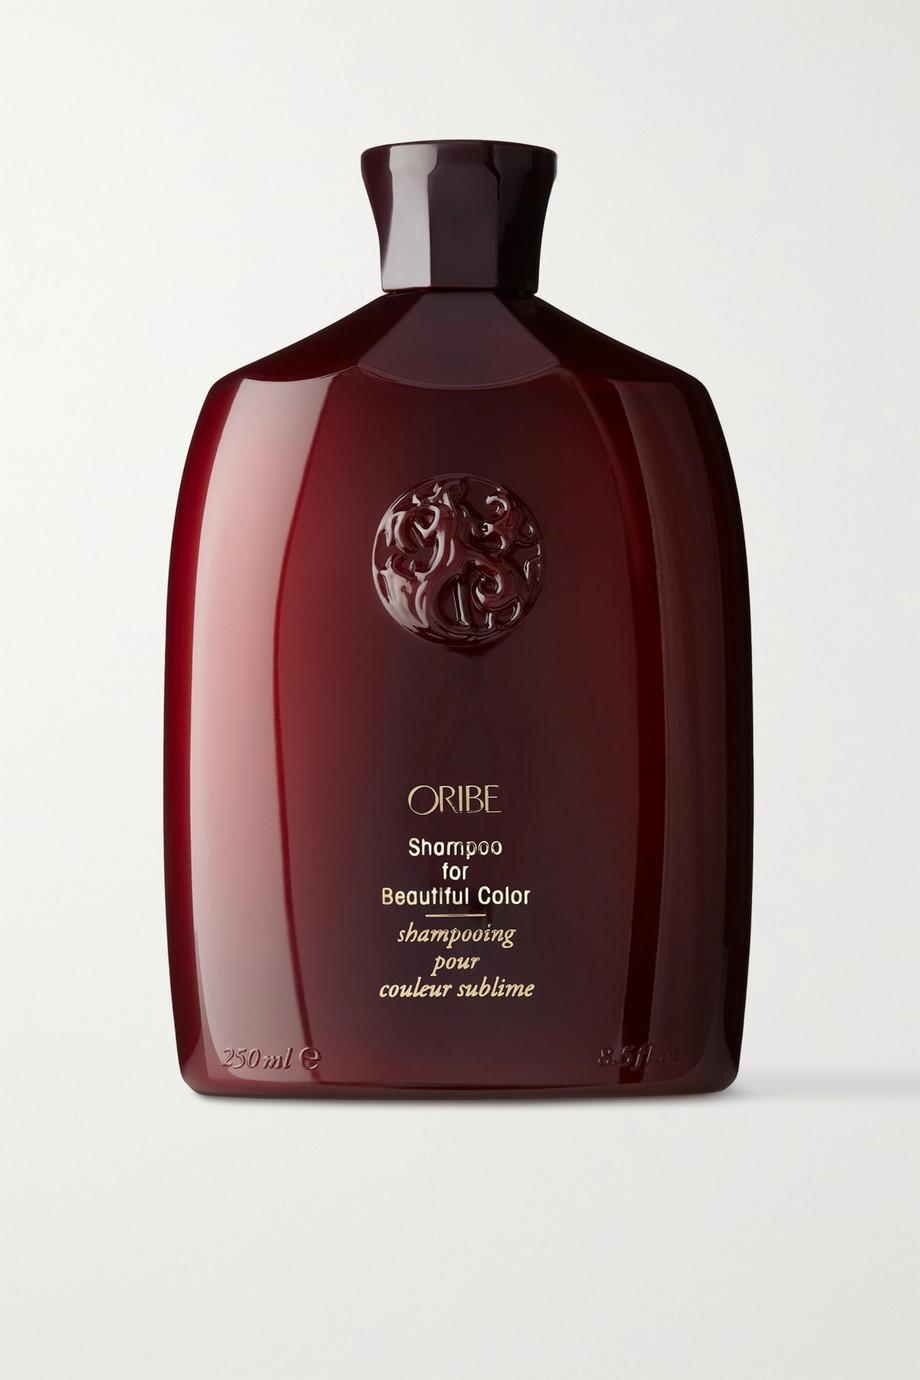 Oribe Shampoo for Beautiful Color, 250ml